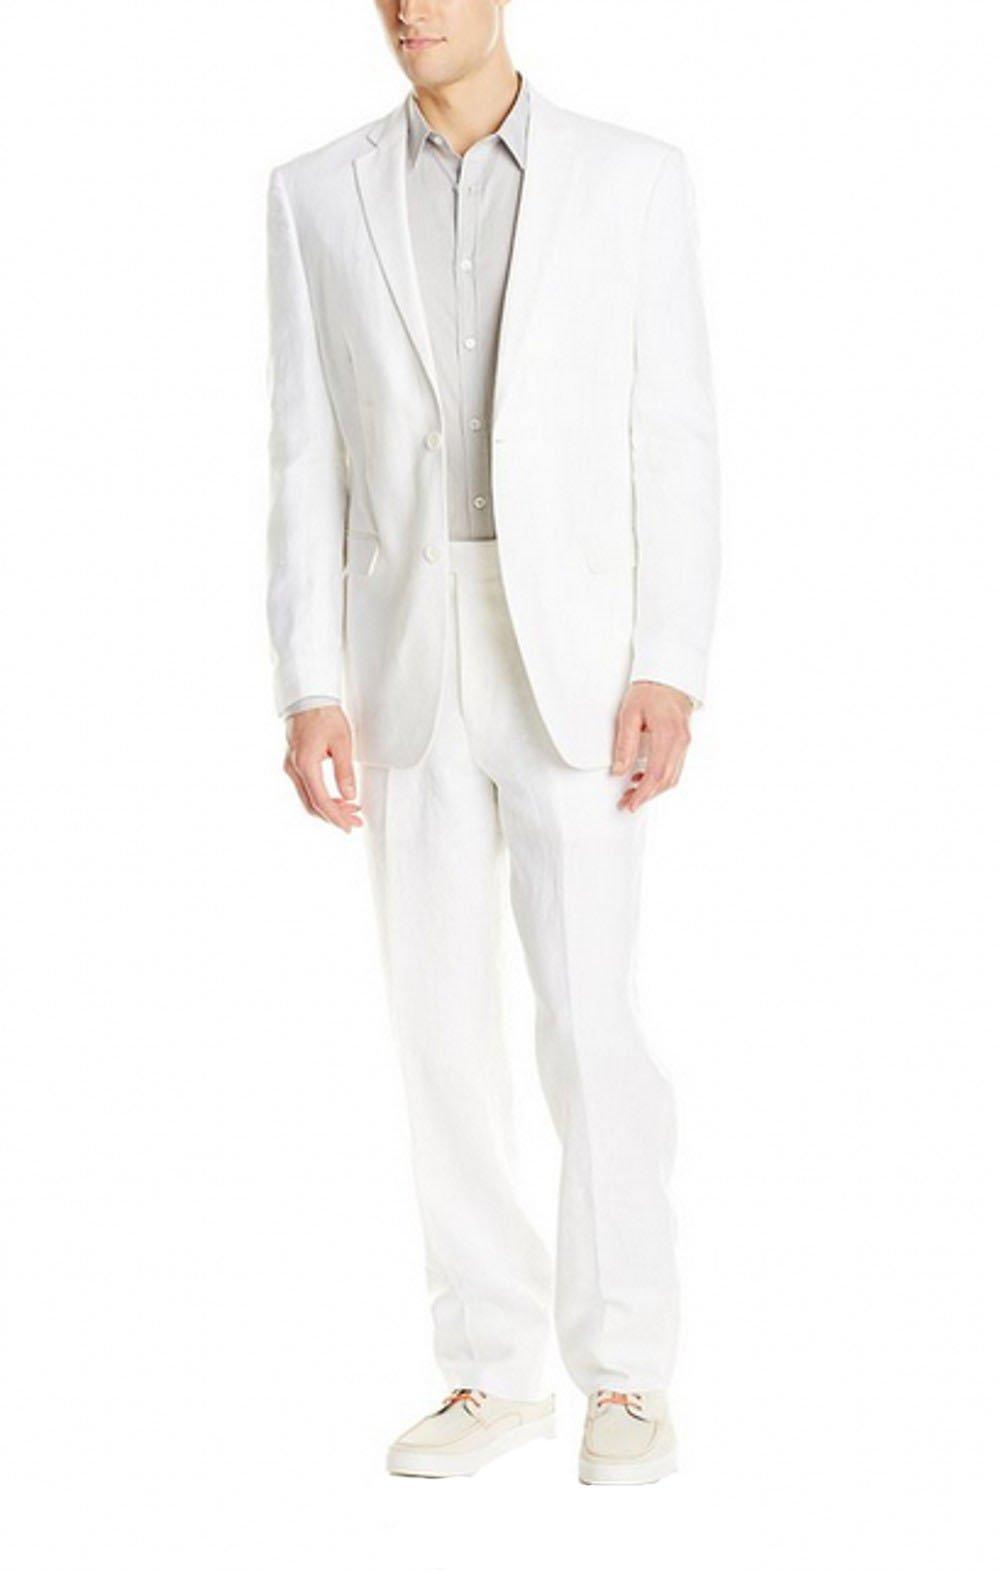 Love Dress Men's Two Button Nested Suit Jacket and Pant XXXXXXL